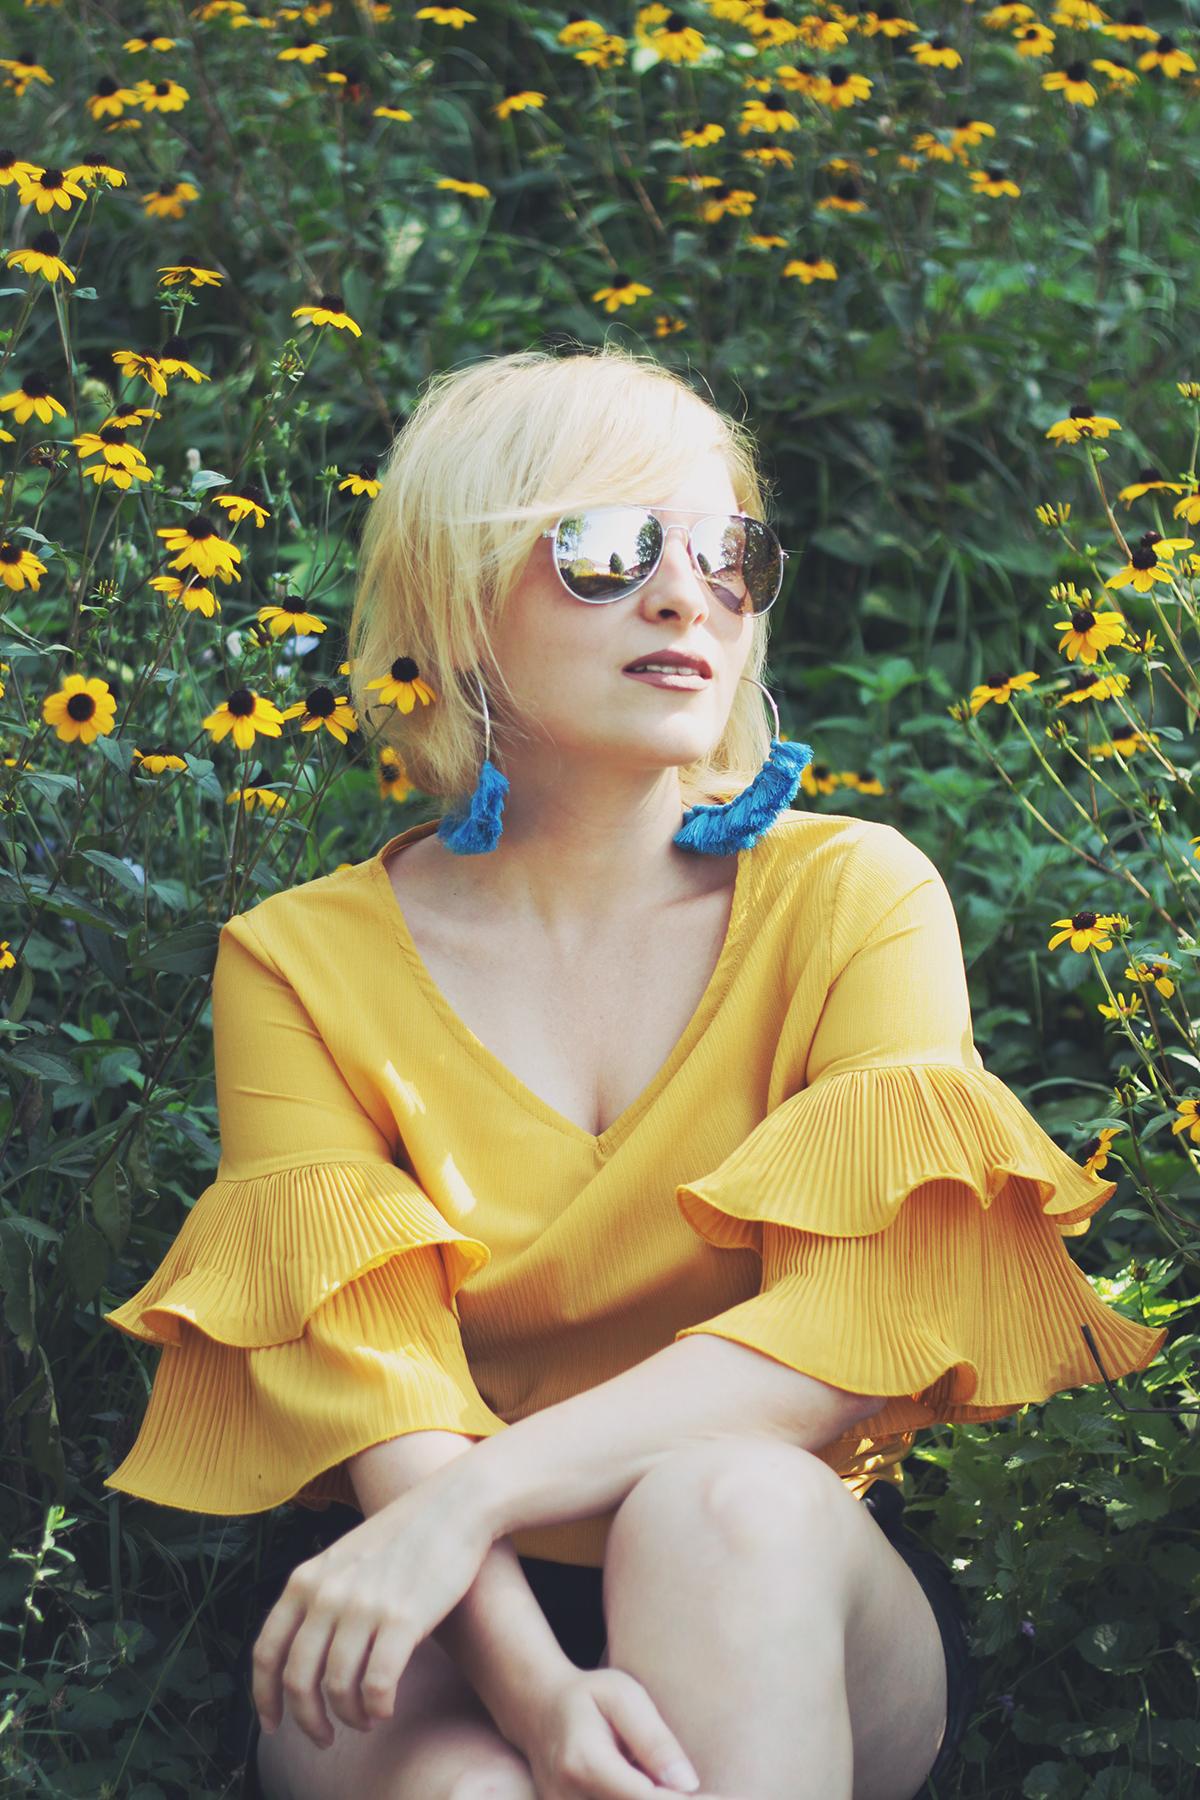 yellow ruffle top, blue tassel earrings, nature, yellow flowers